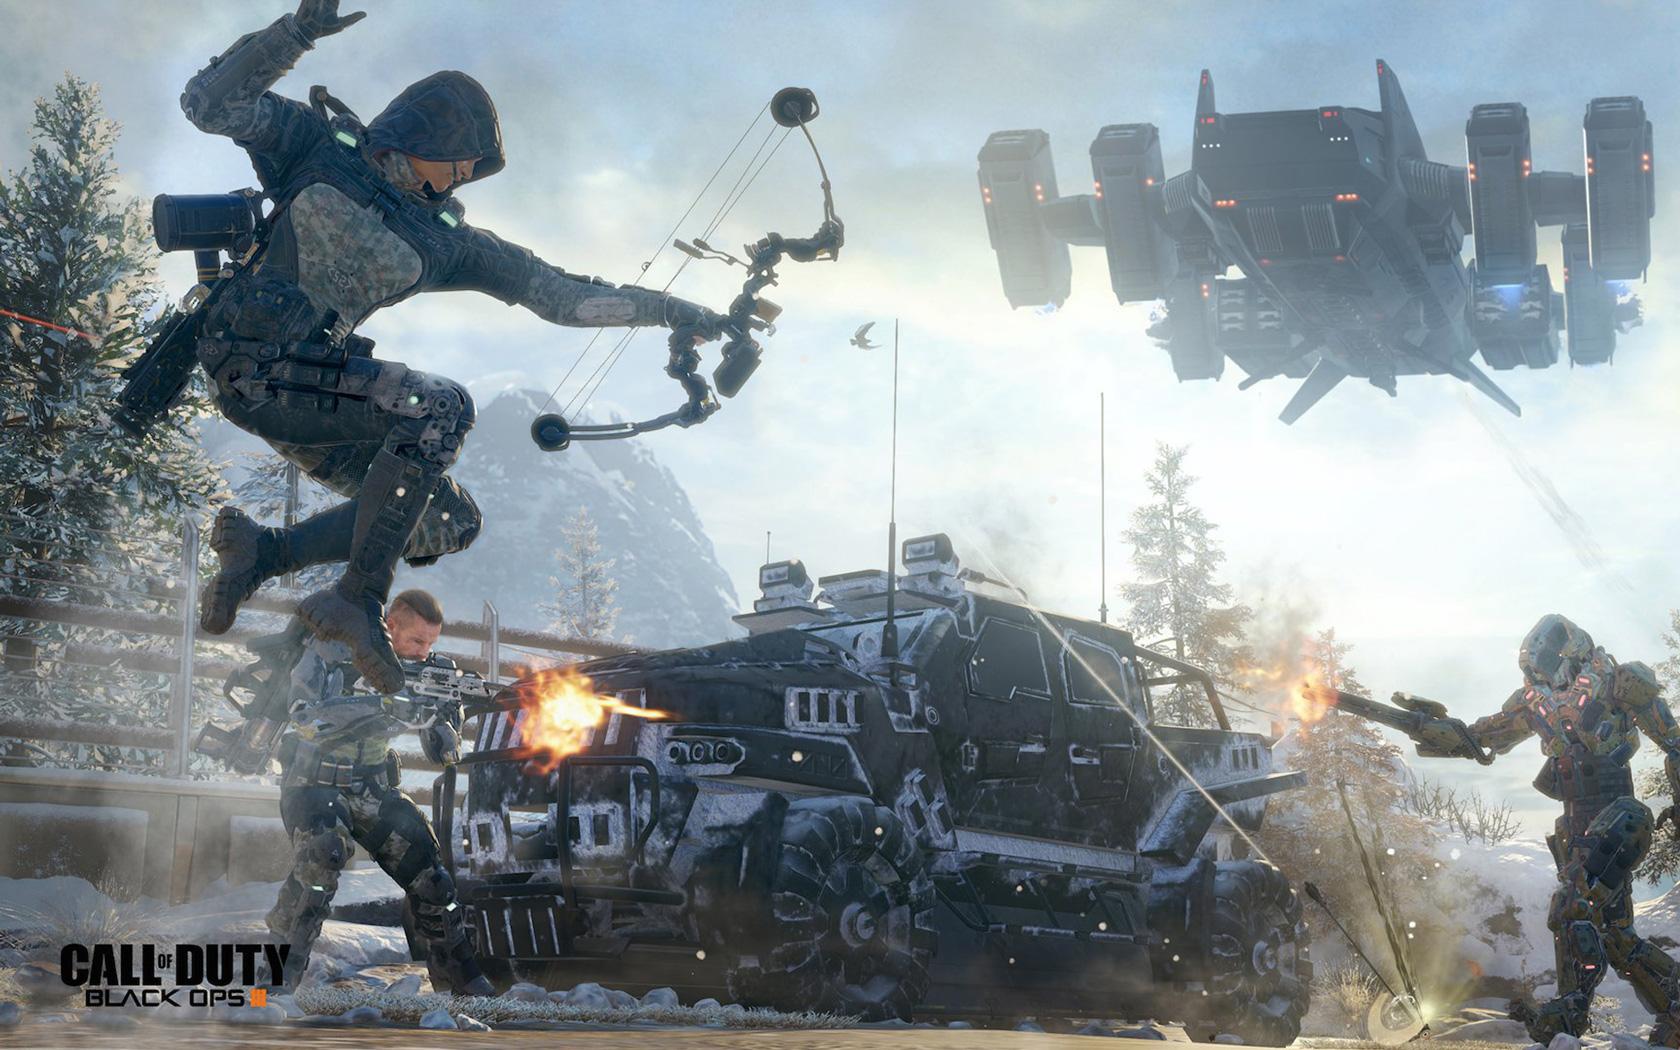 Free Call of Duty: Black Ops III Wallpaper in 1680x1050